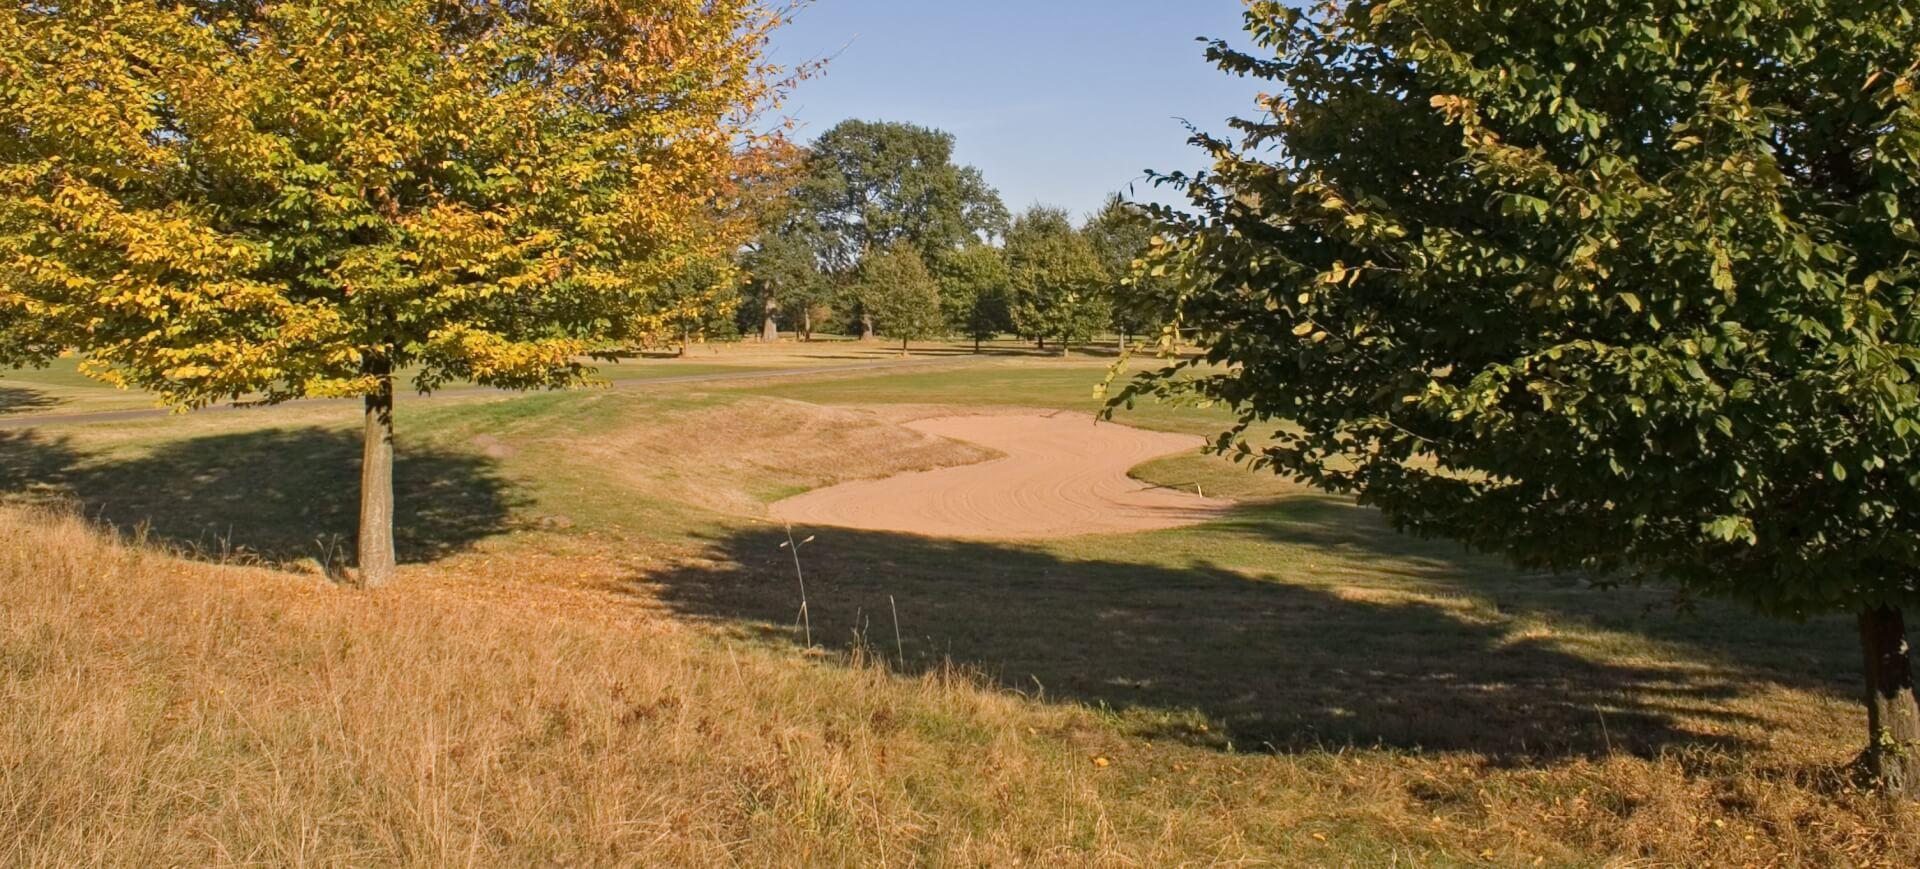 https://golfclub-peckeloh.de/wp-content/uploads/2018/02/PICT0308-e1519814467162.jpg